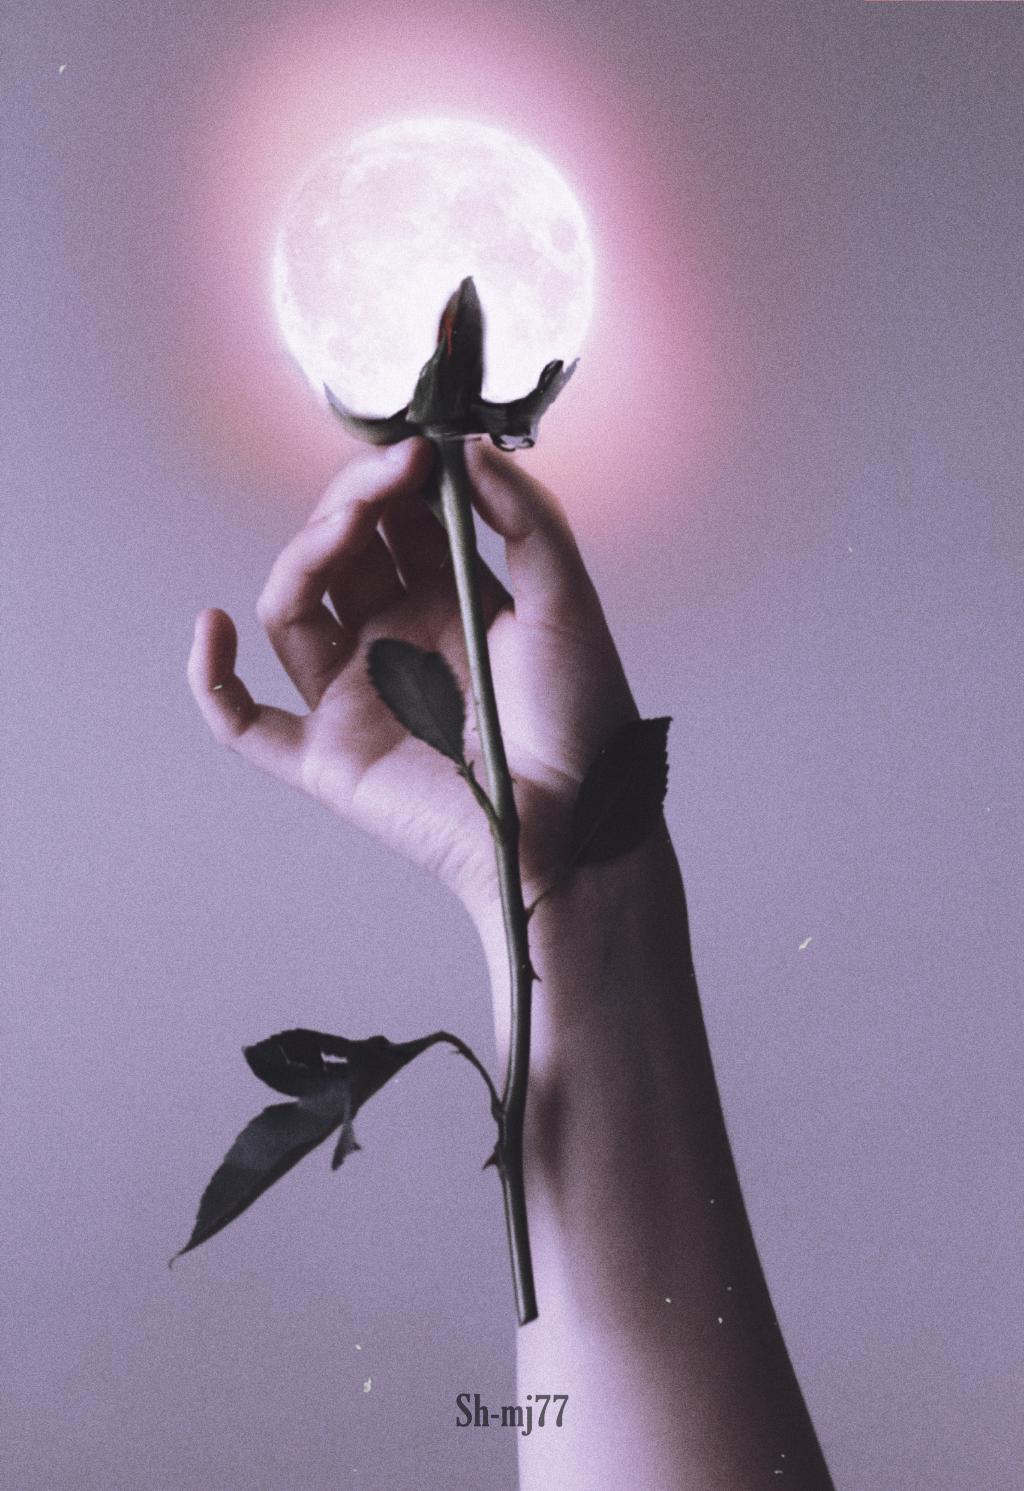 #freetoedit#flower#moon#hands